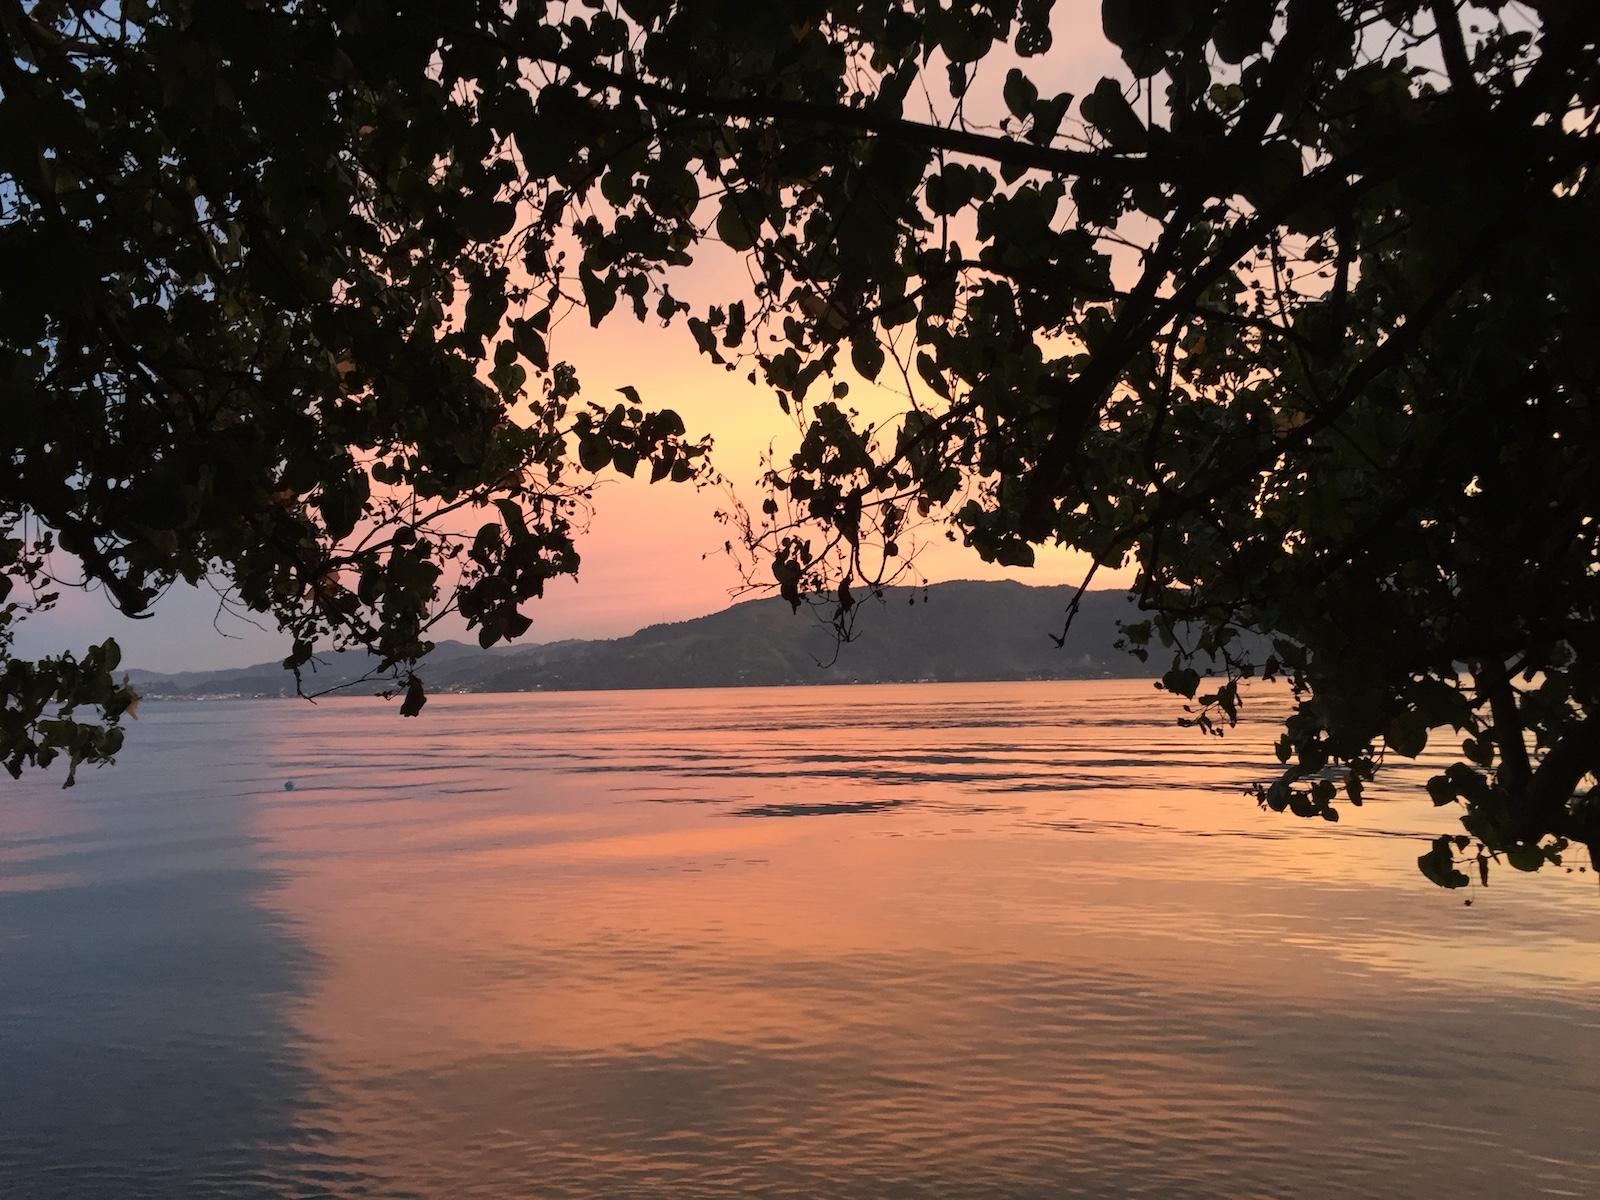 sonnenuntergang-indonesien-ambon-molukken-tauch-reise-tourameo